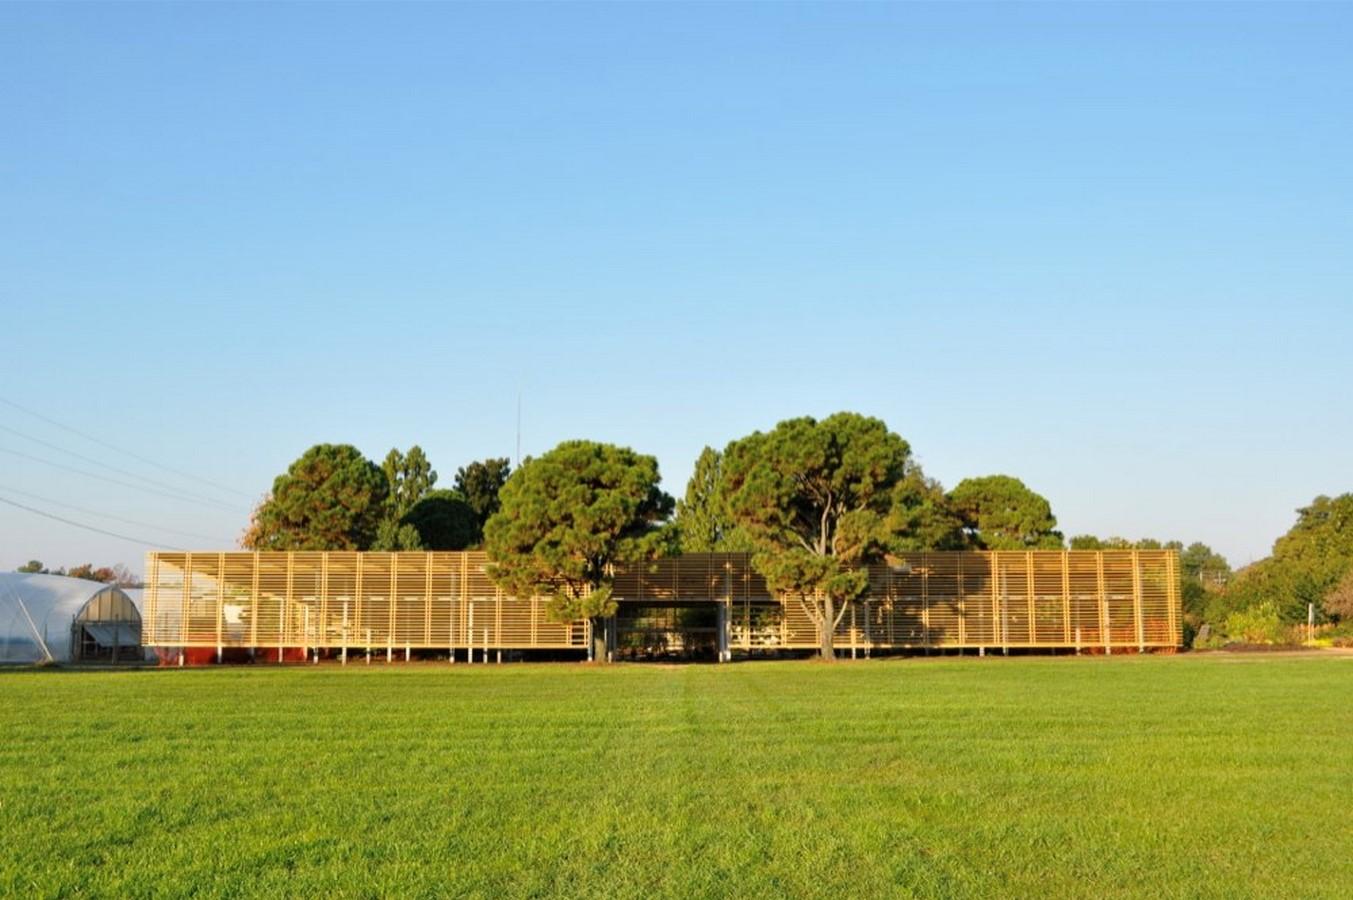 JC Raulston Arboretum Lath House Raleigh, NC ⎥ 2010 - Sheet2